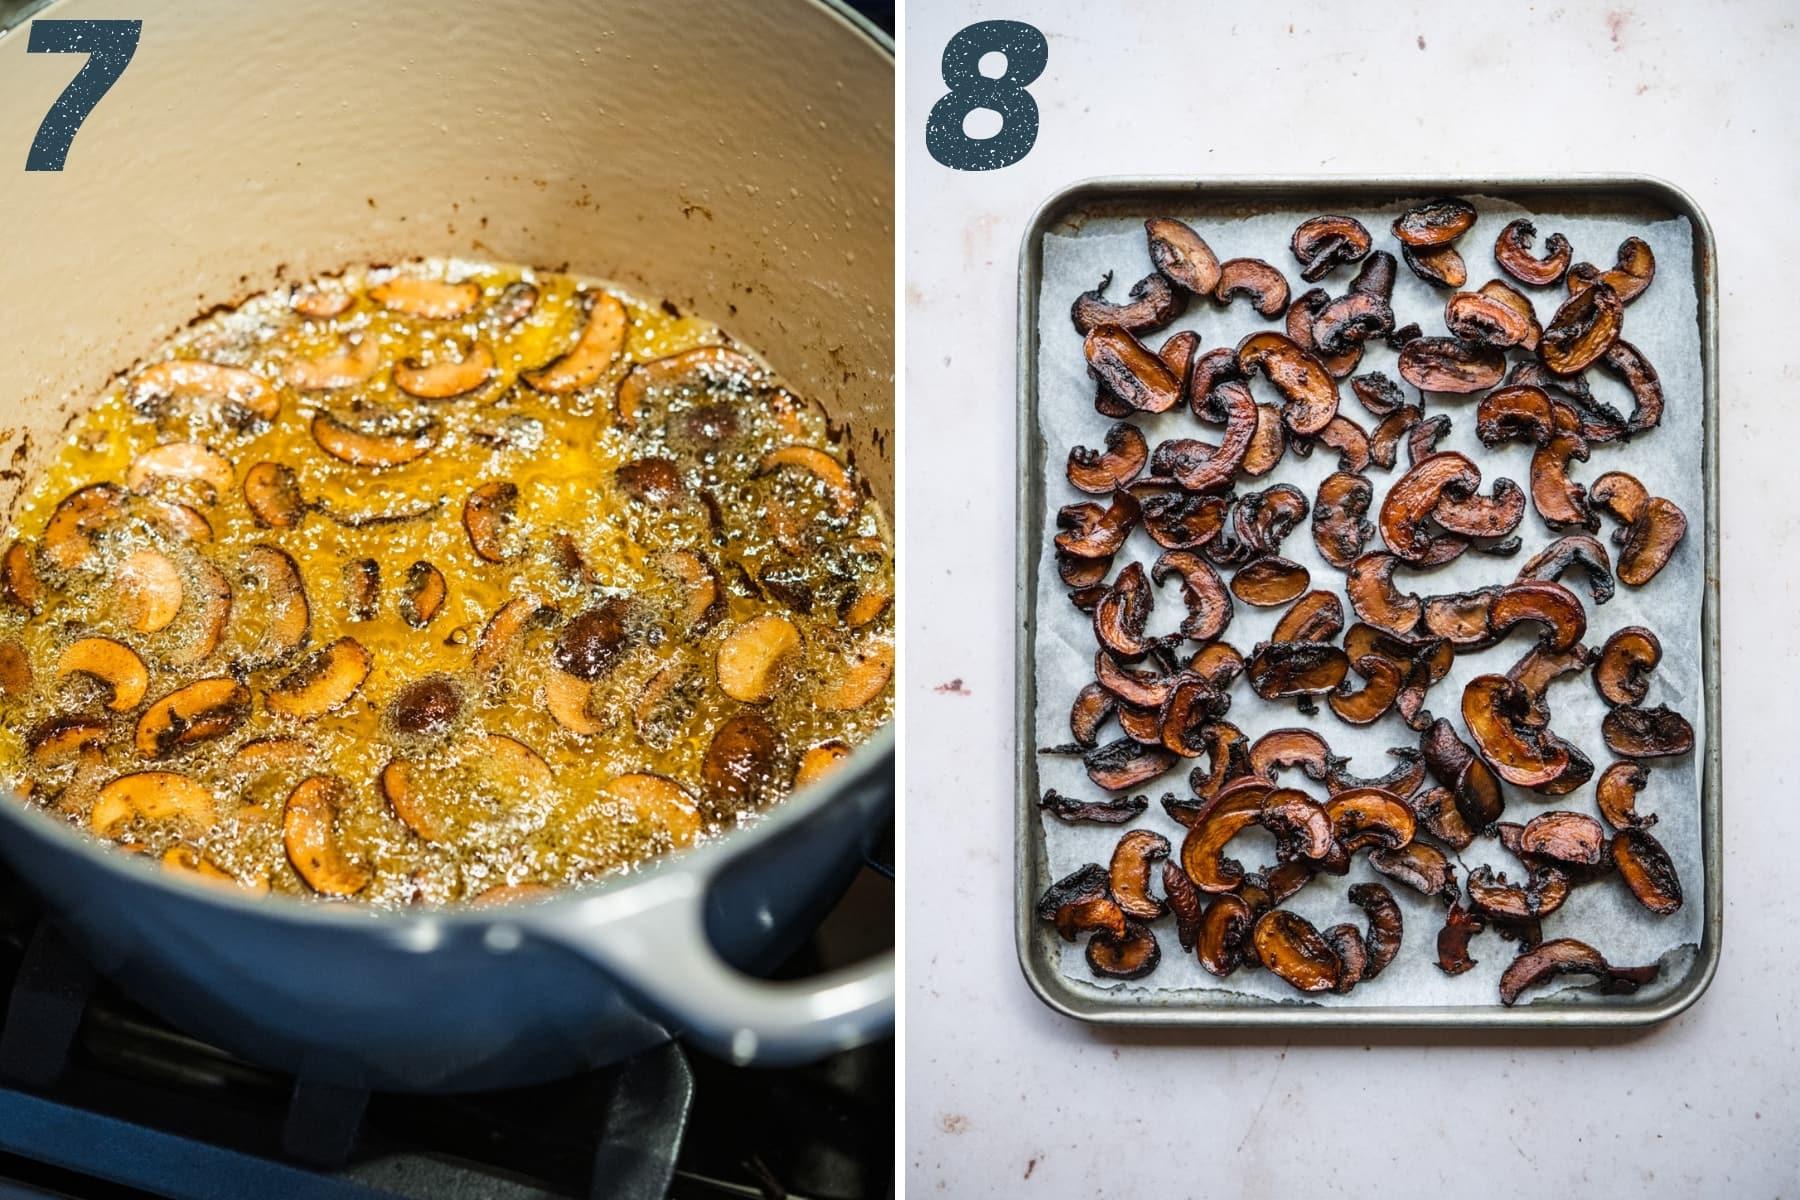 on the left: mushroom bacon deep frying in oil. on the right: mushroom bacon on a sheet pan with parchment paper.